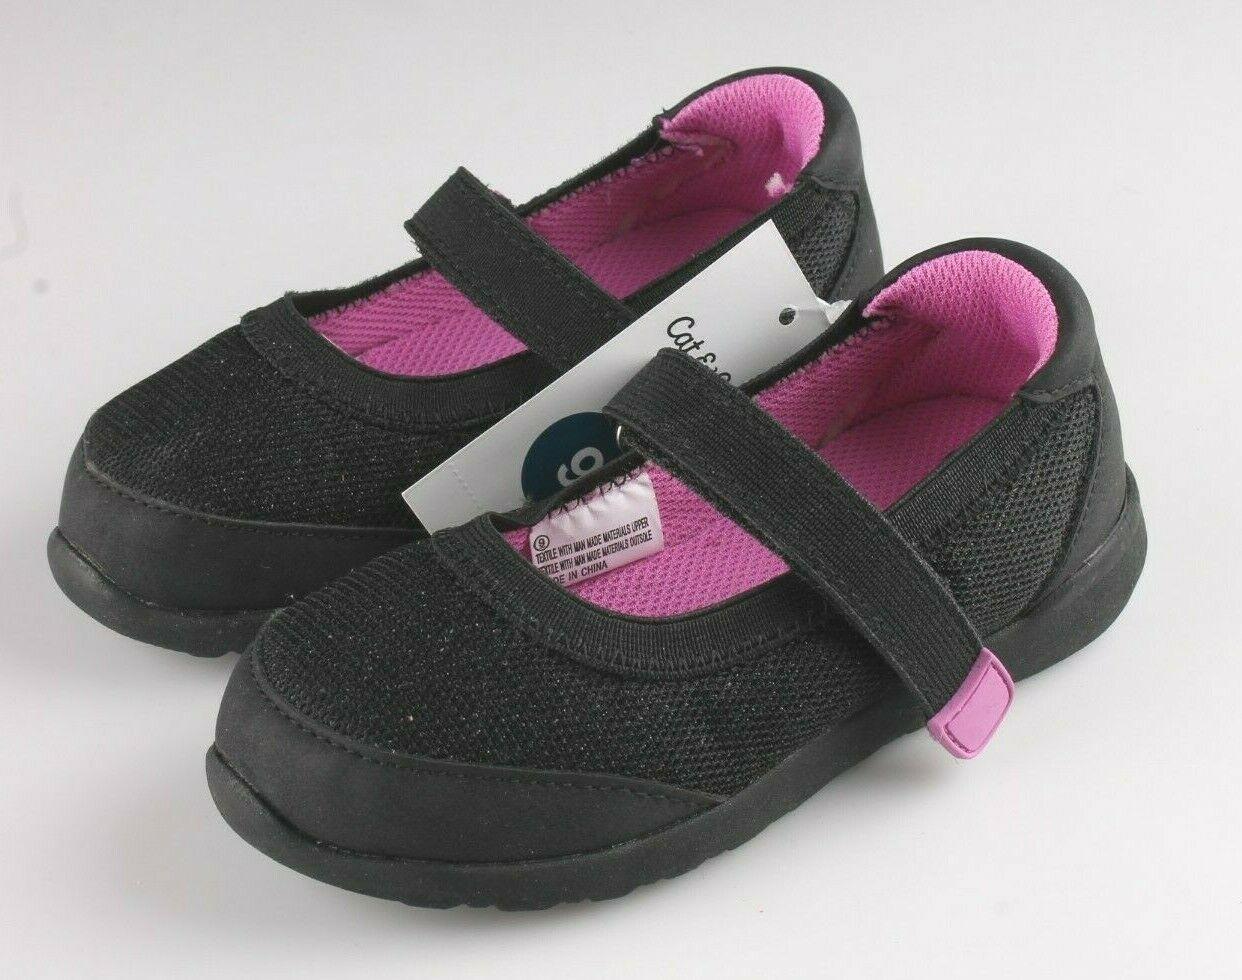 Cat & Jack Girls Black Purple Eva Slip-On Flats Sneakers Toddler Size 9 US